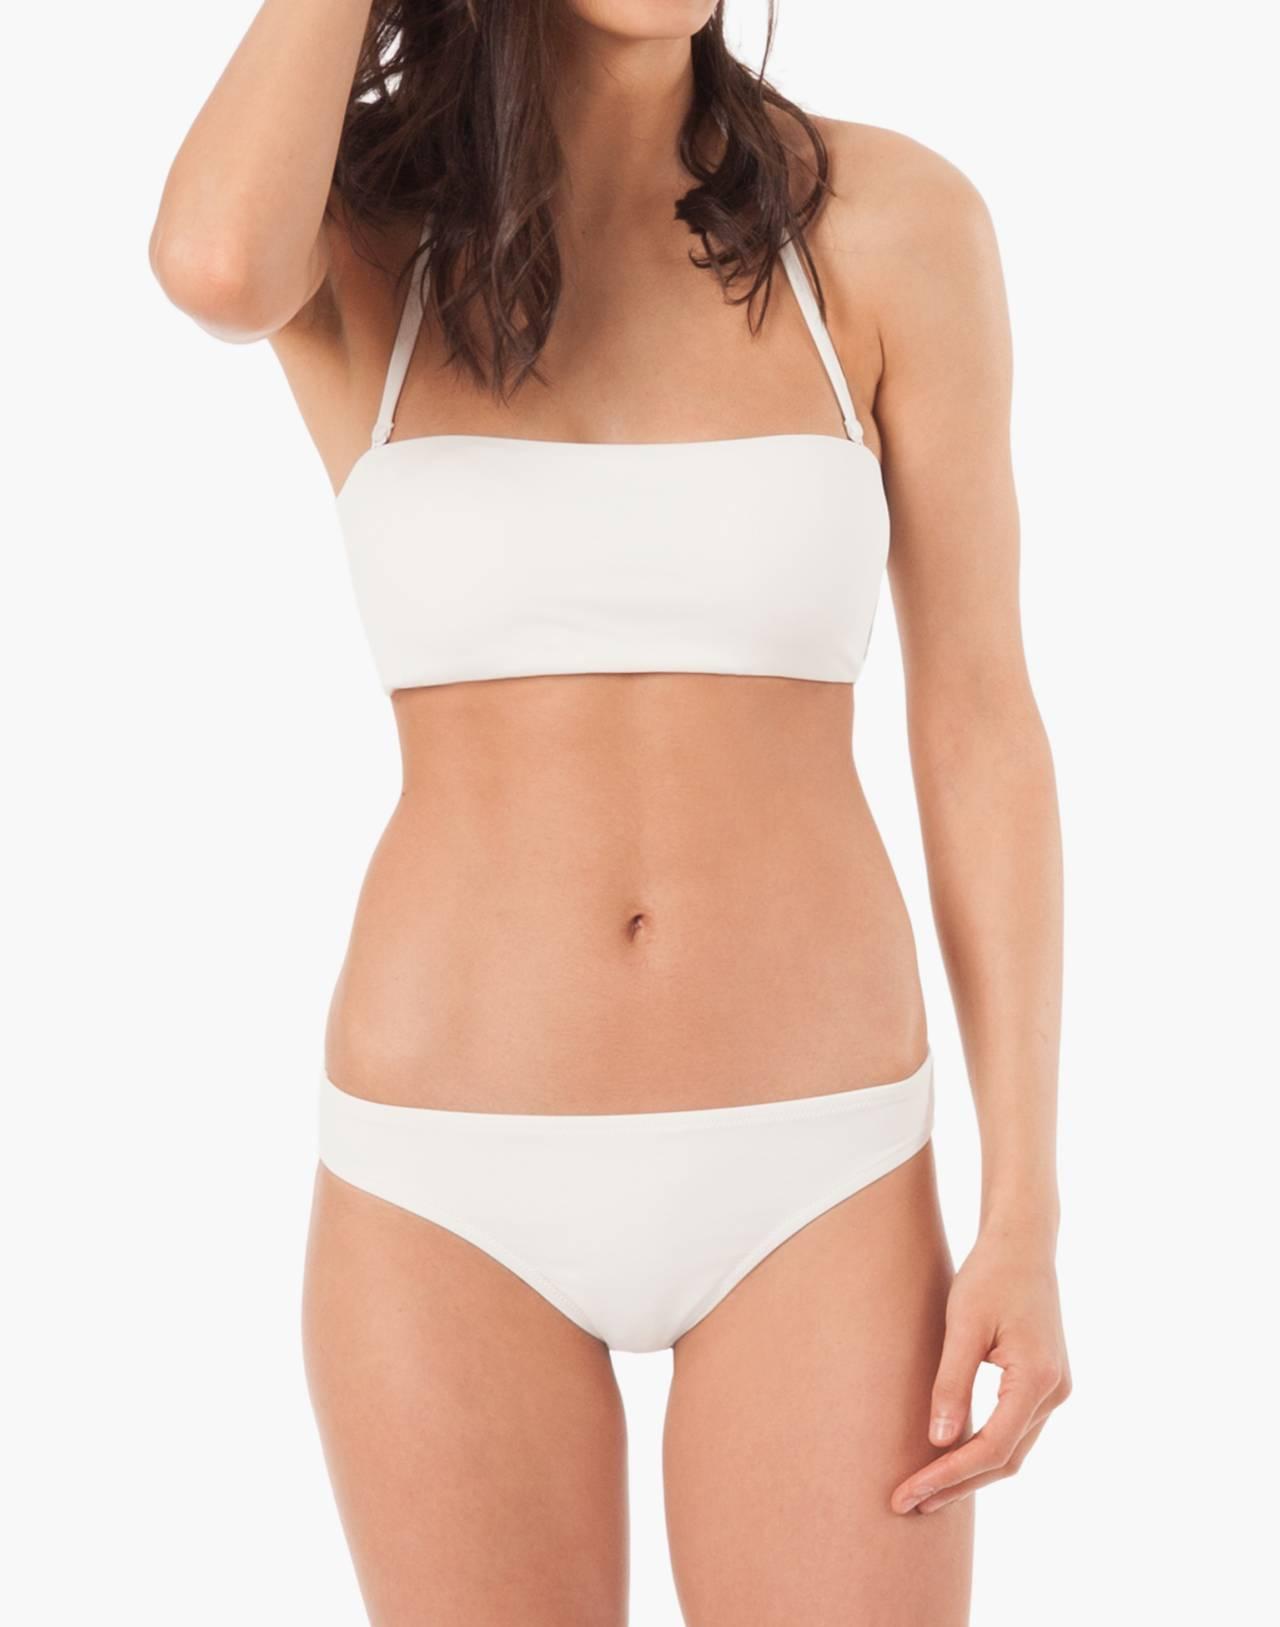 LIVELY™ Bandeau Bikini Top in white image 1